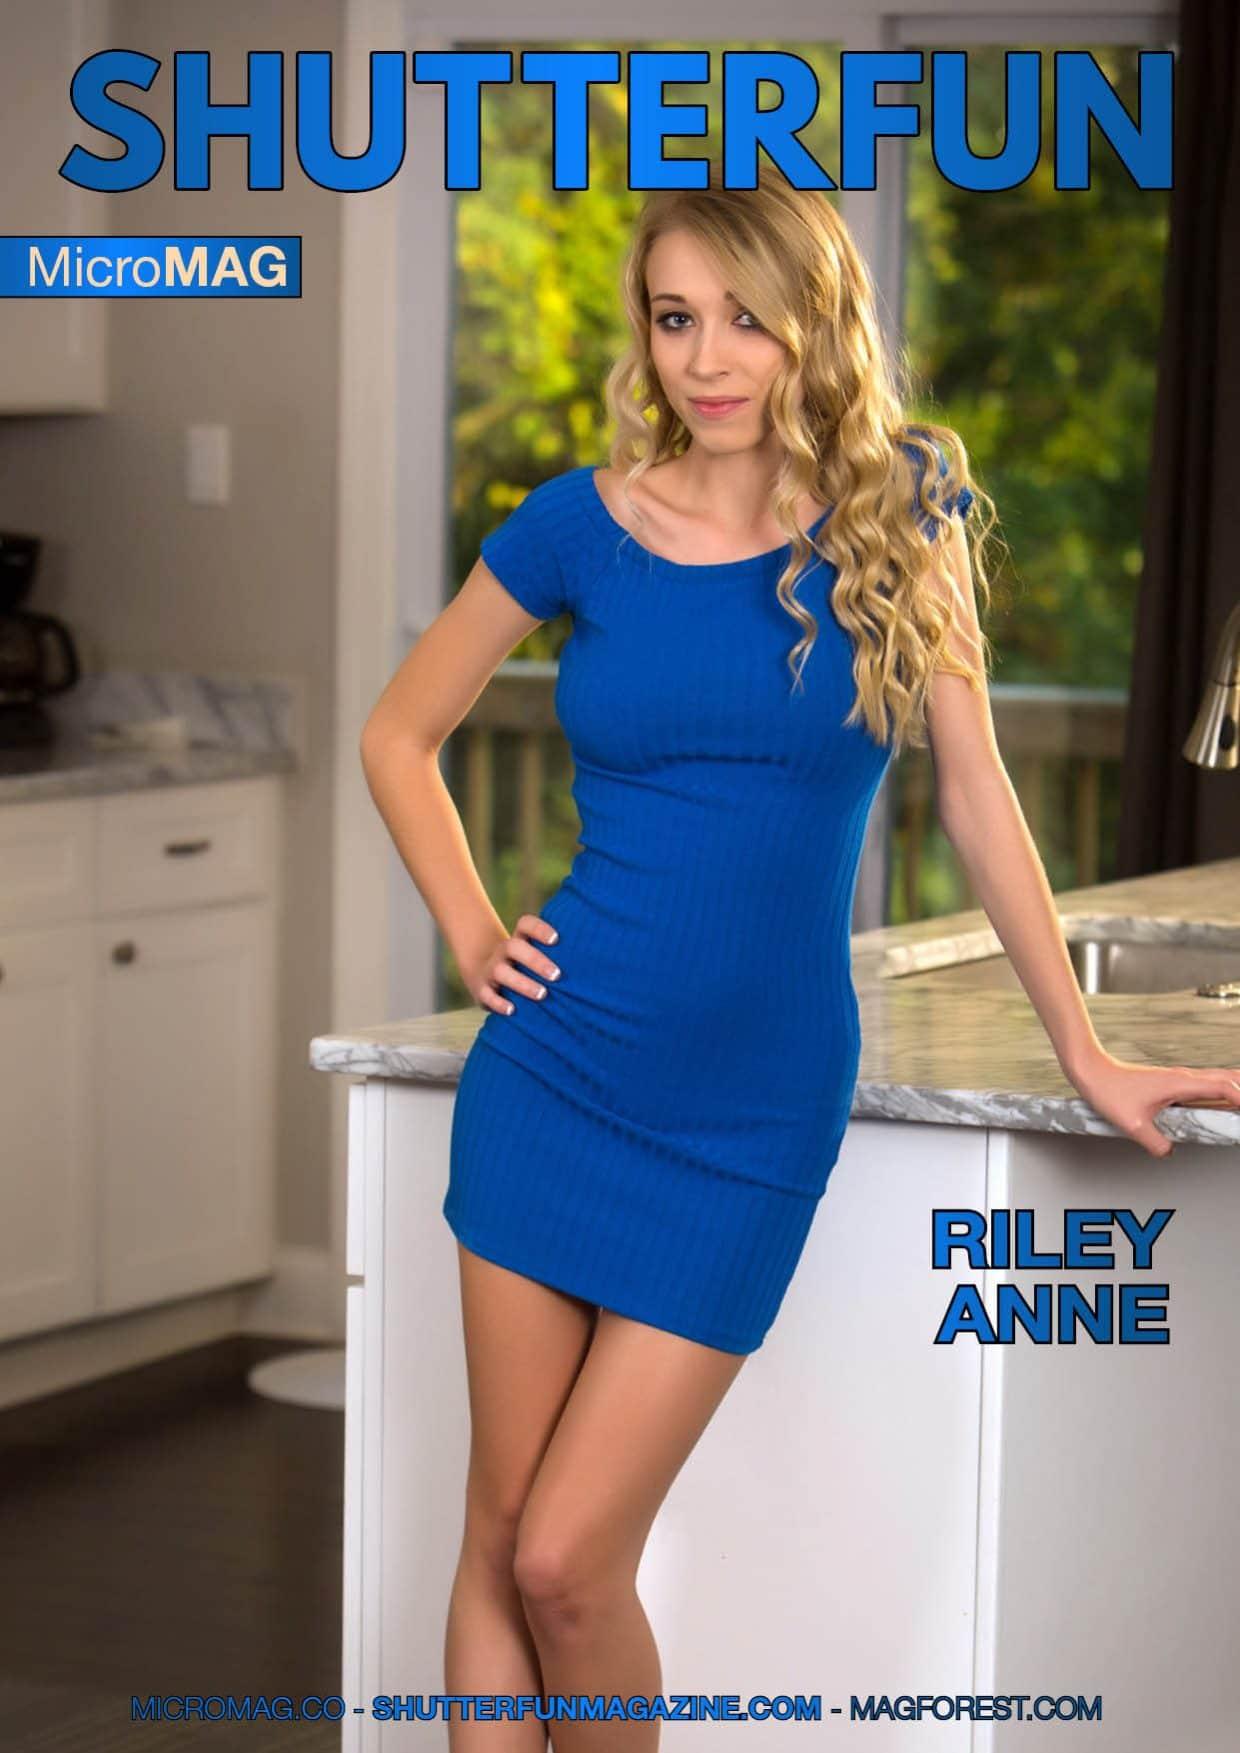 Shutter Fun MicroMag - Riley Anne 1